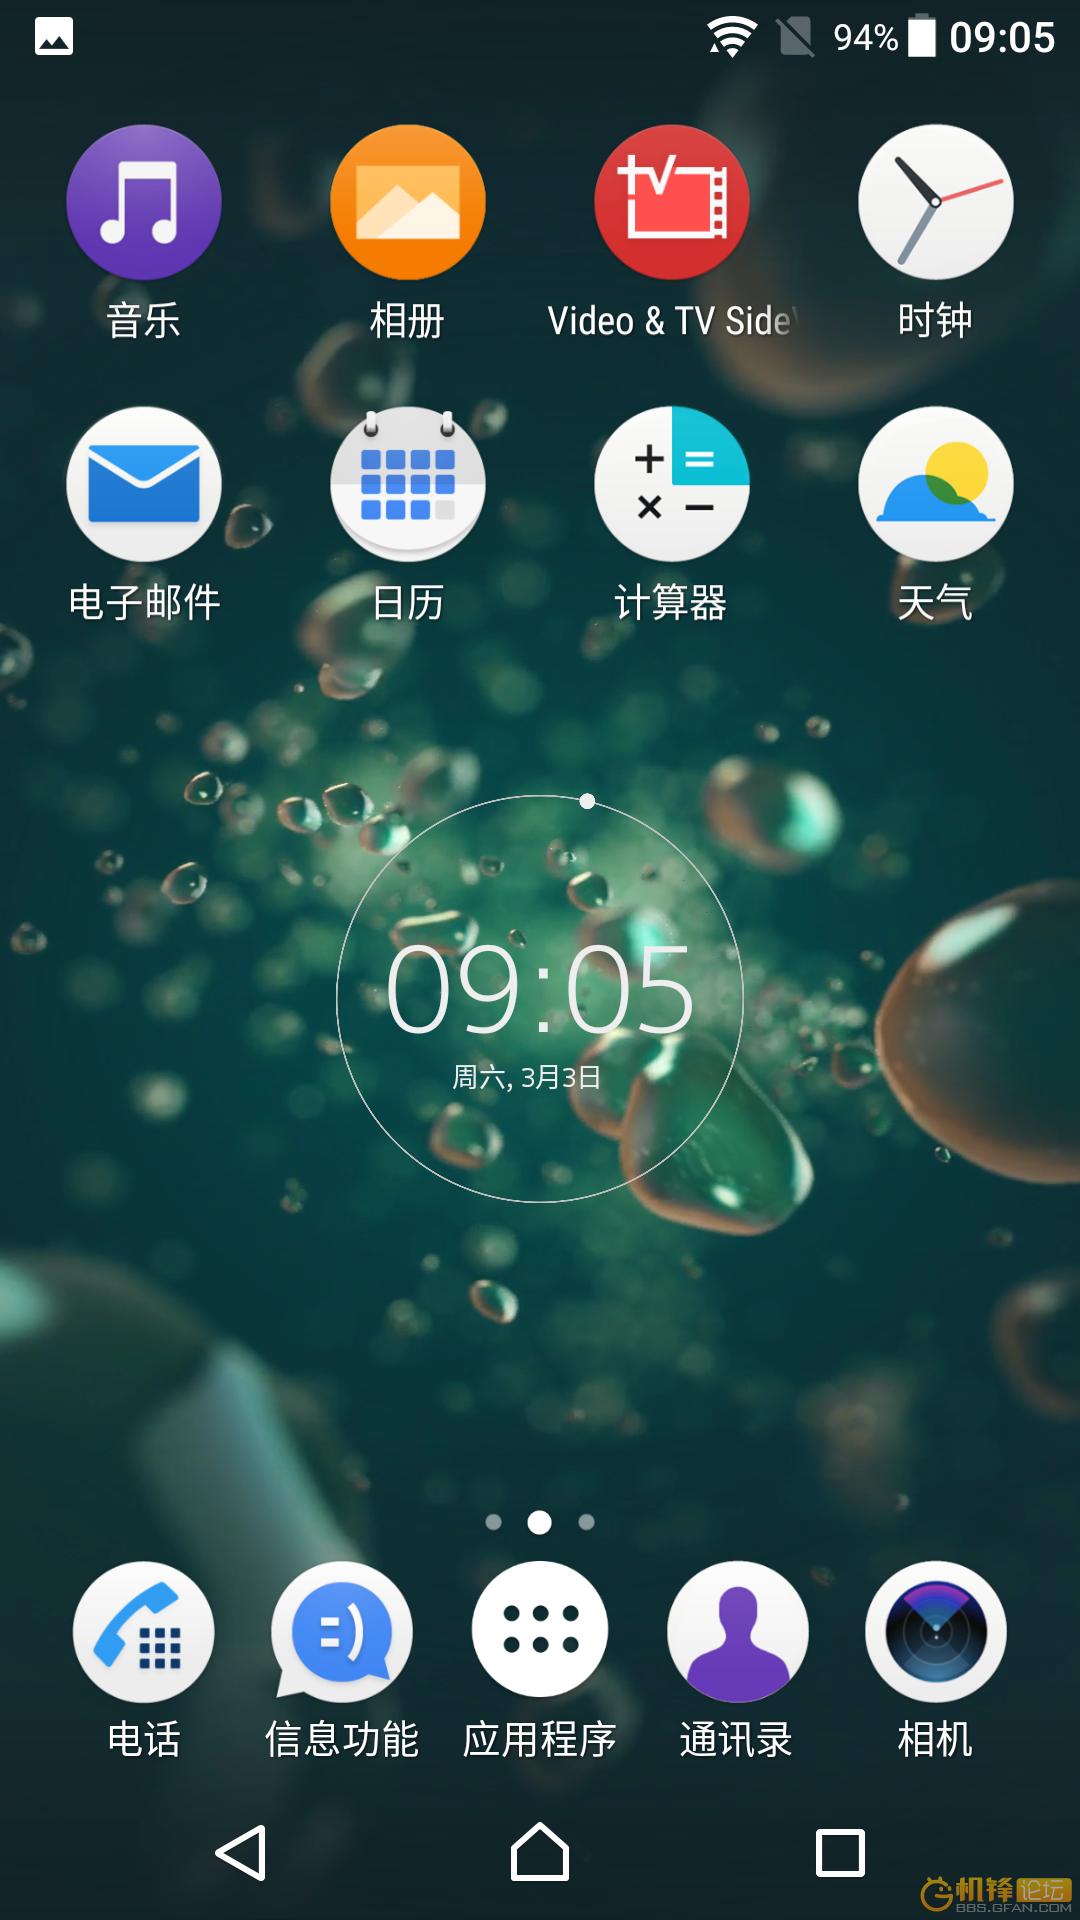 Screenshot_20180303-090504.png